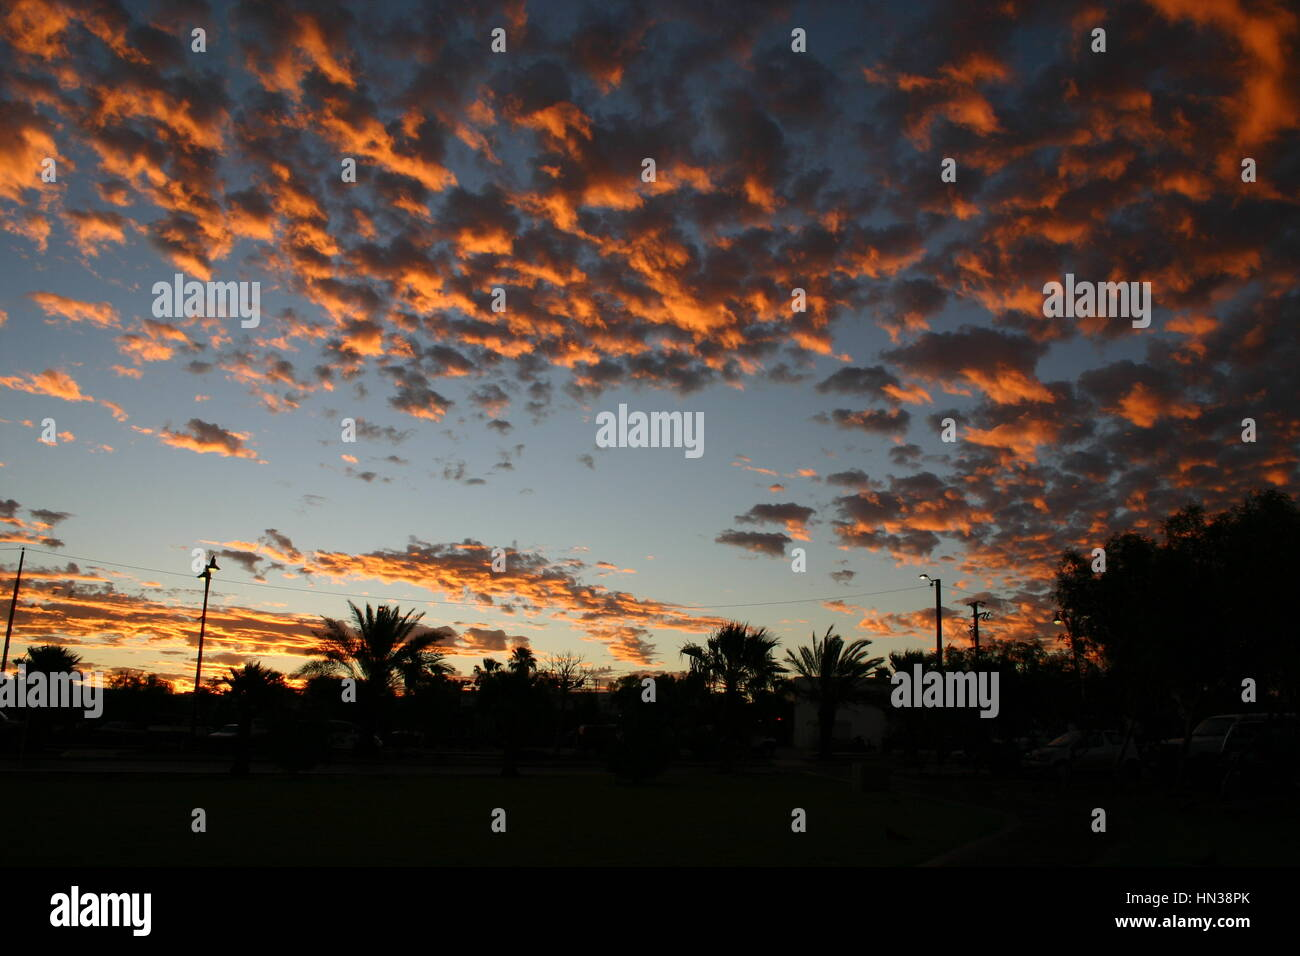 West Australia - Stock Image